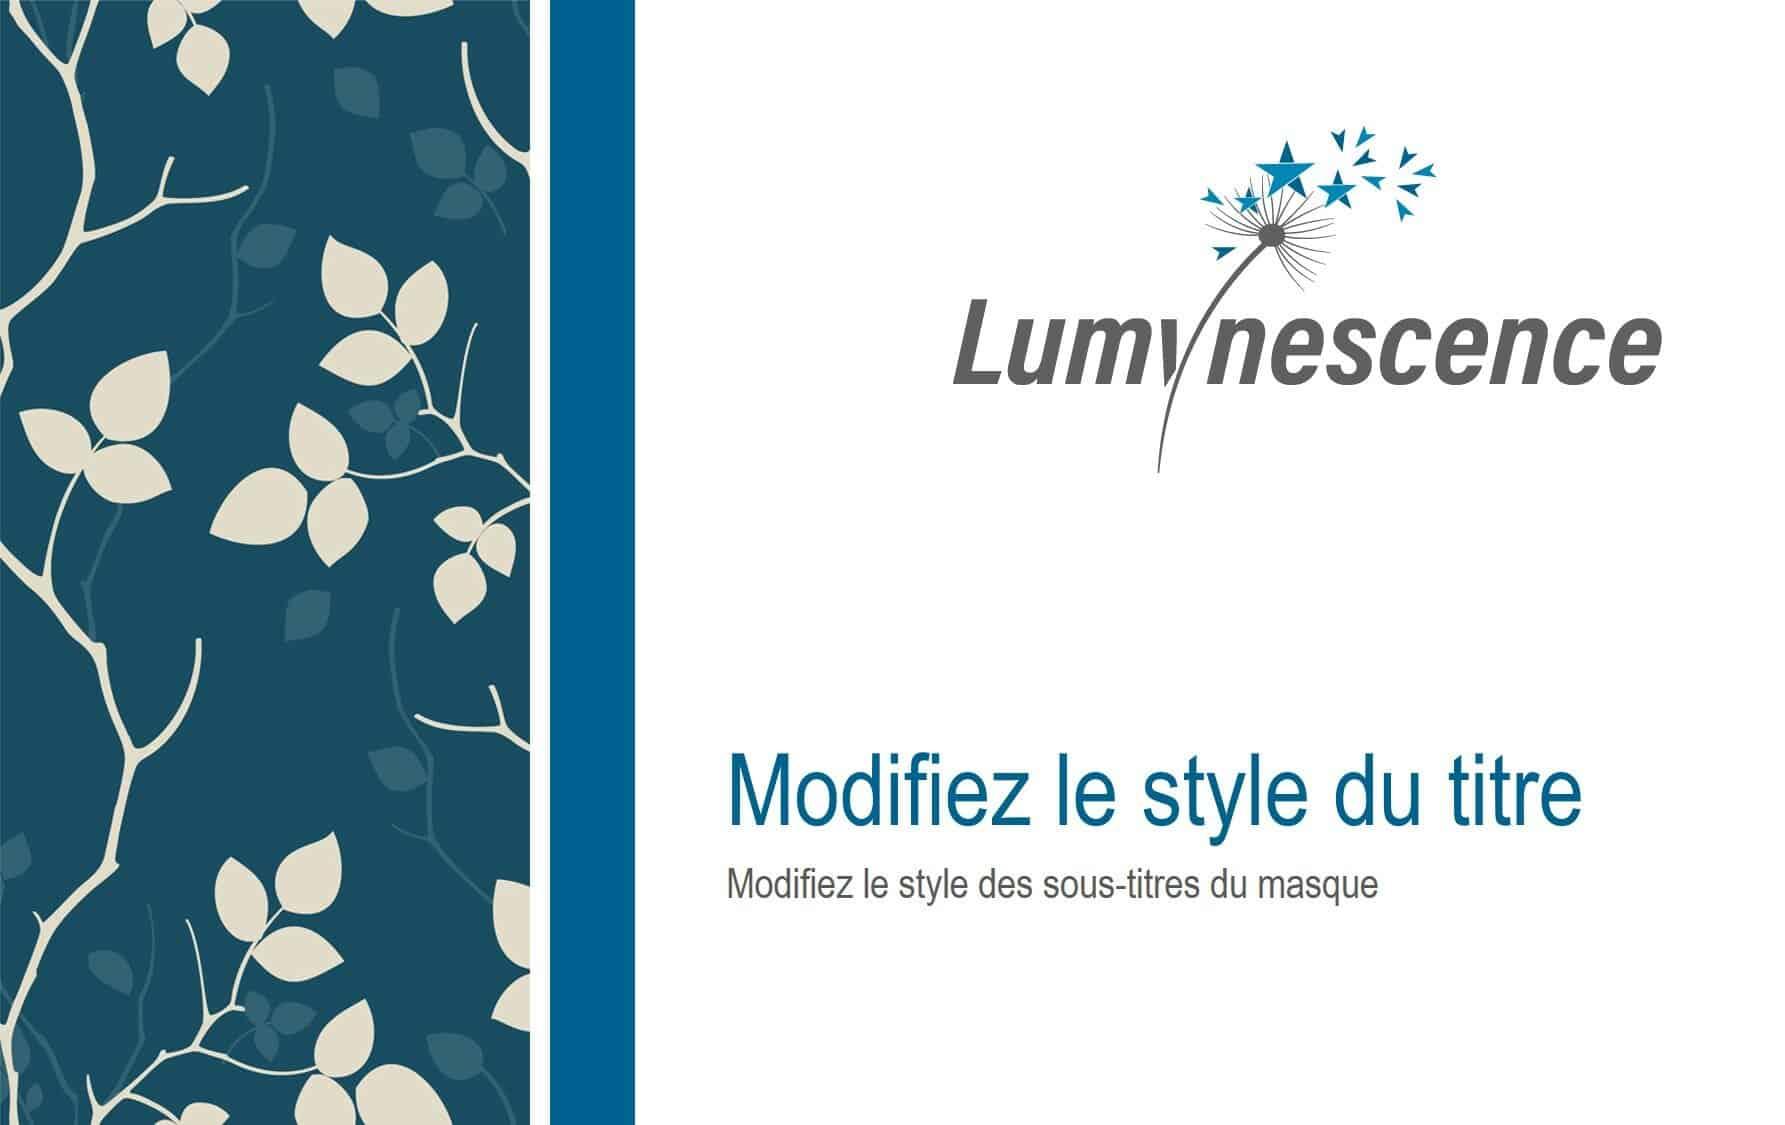 Masque Powerpoint Lumynescence